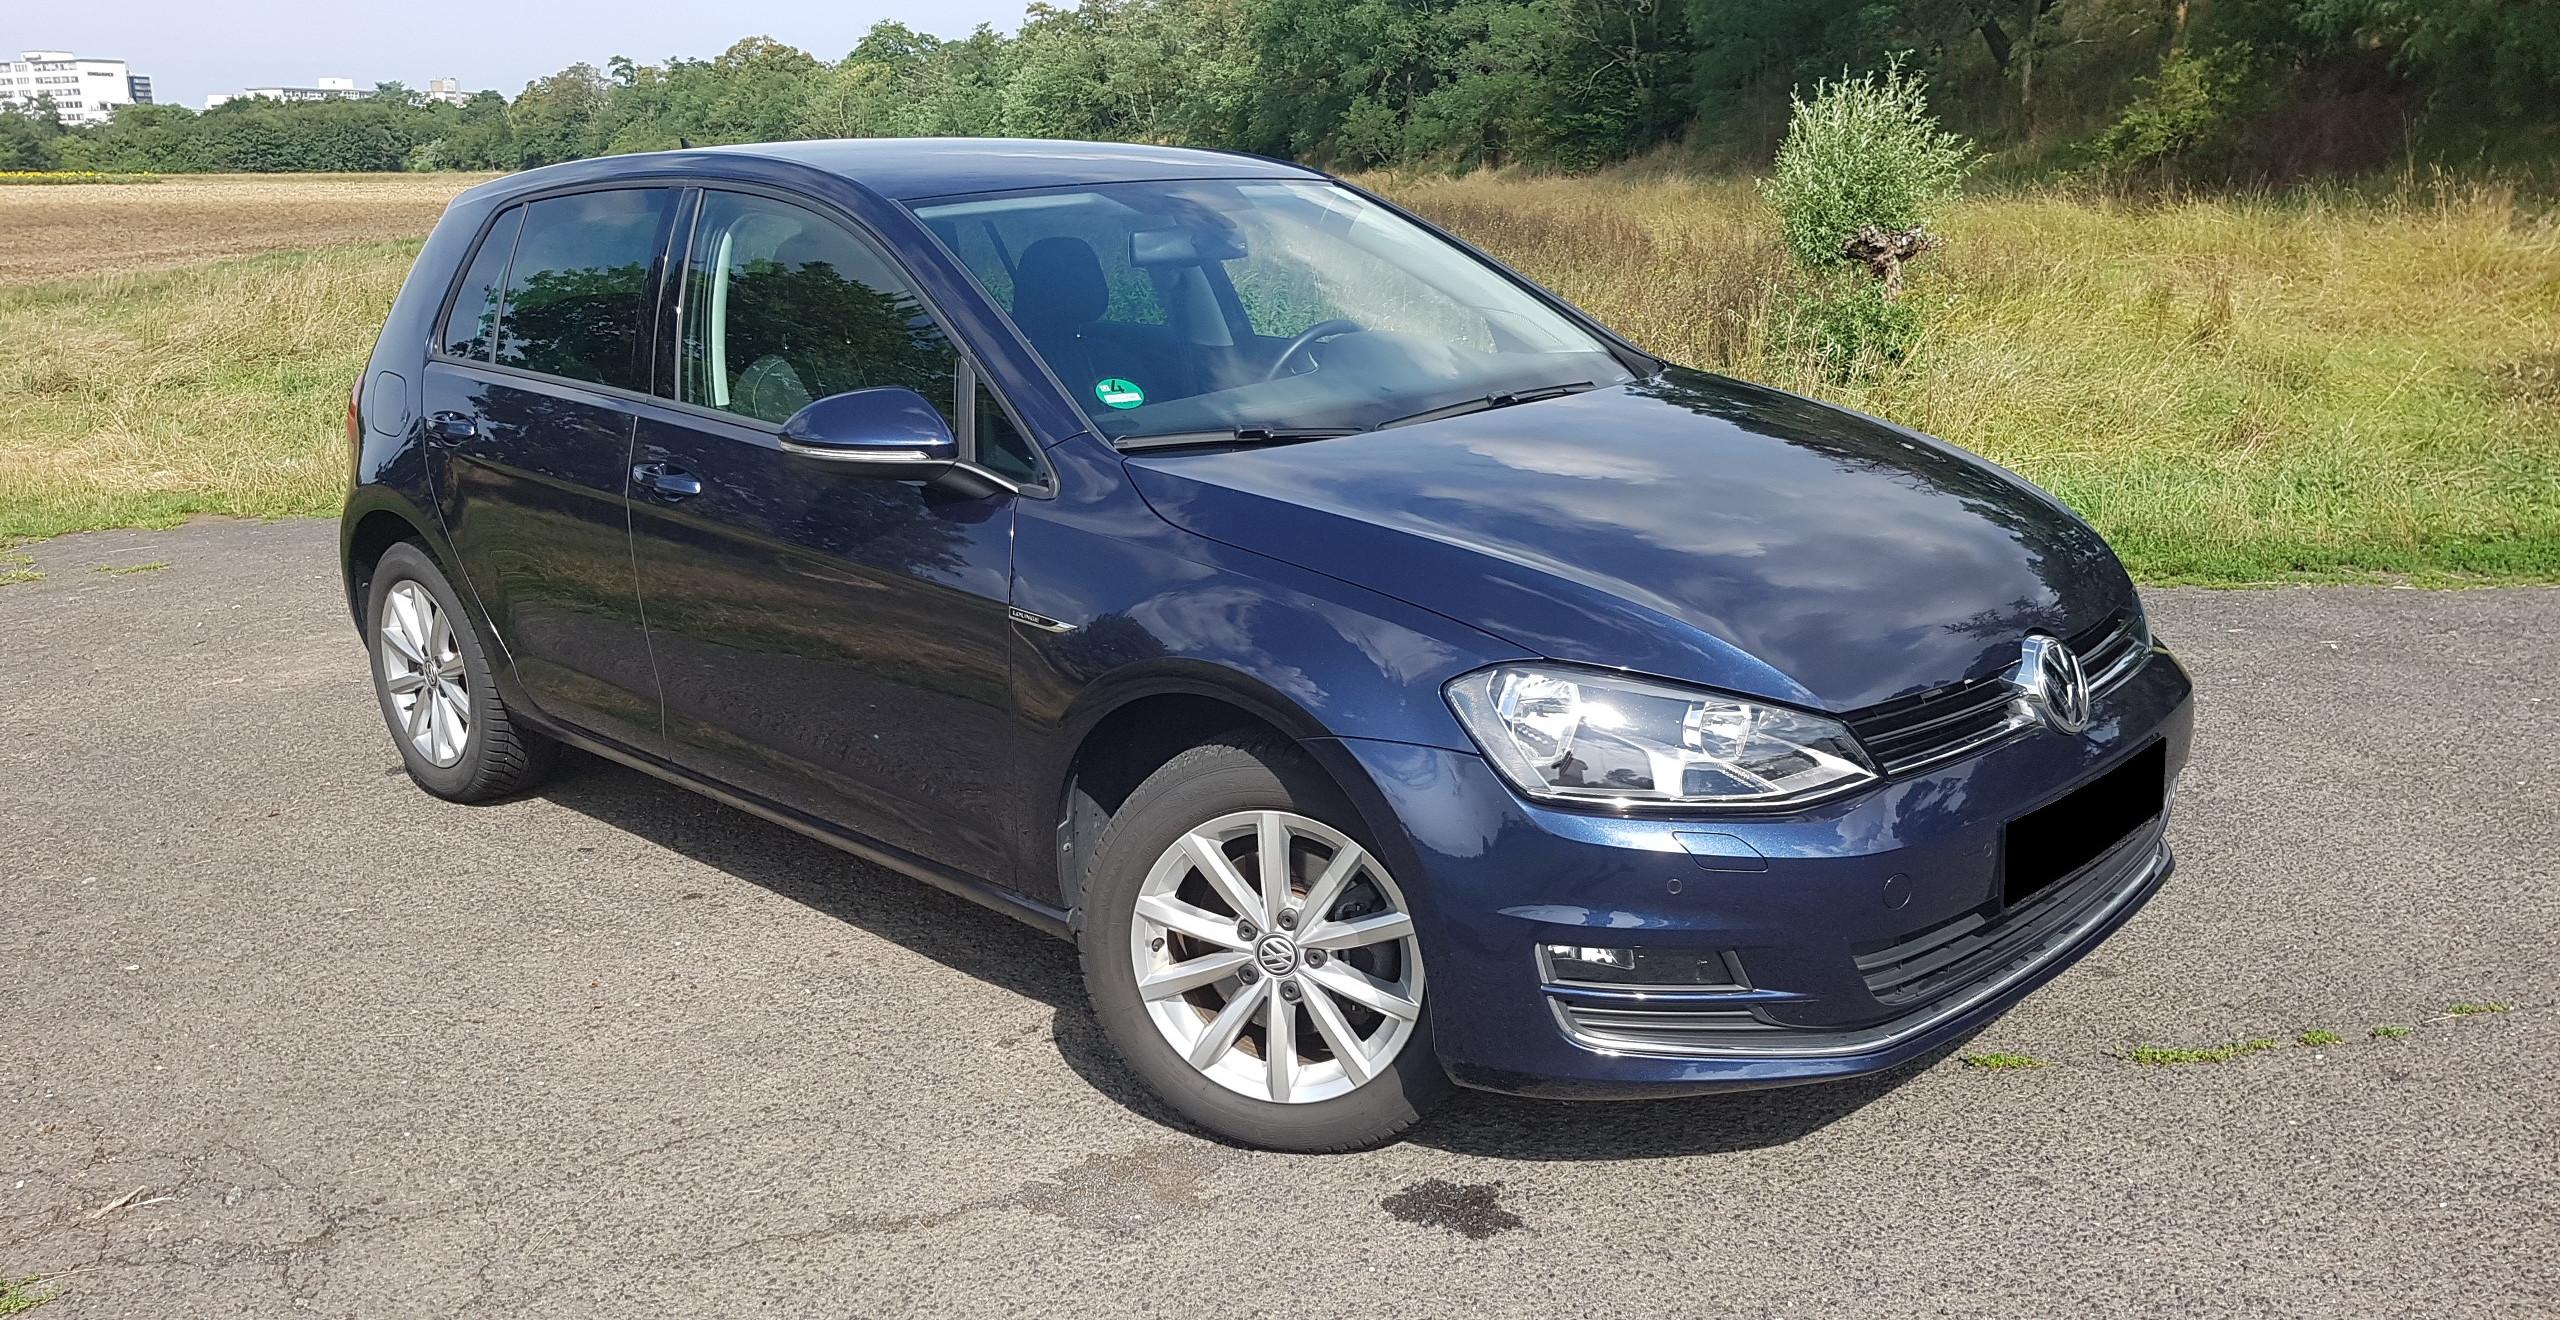 Import Auto Allemagne - Auto Convoi Allemagne - Volkswagen Golf 7 Lounge Bluemotion 1.6 TDI 110ch